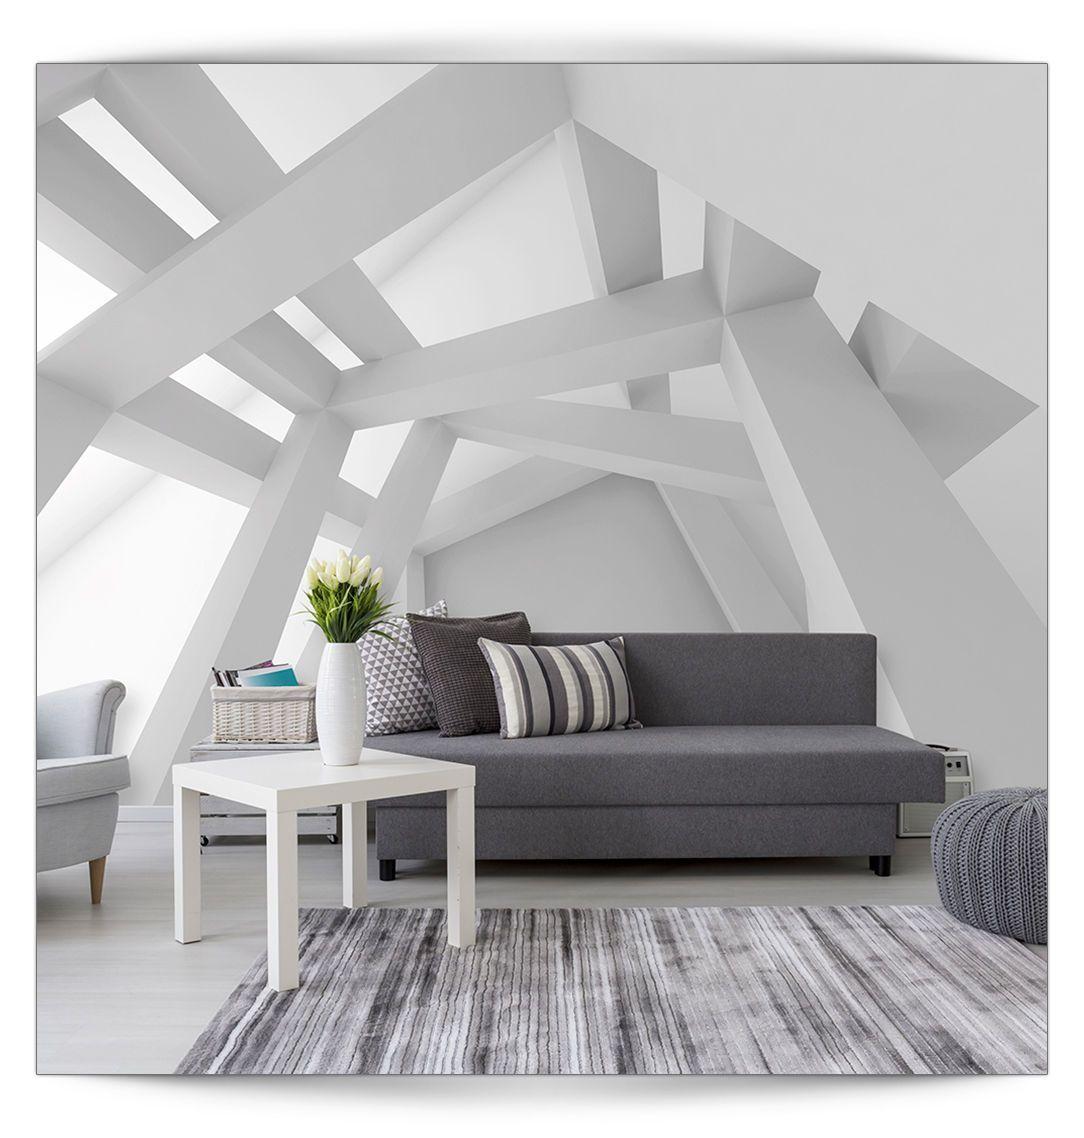 Home interior tapeten design vlies fototapete d effect tapete tapeten schlafzimmer wandbild xxl